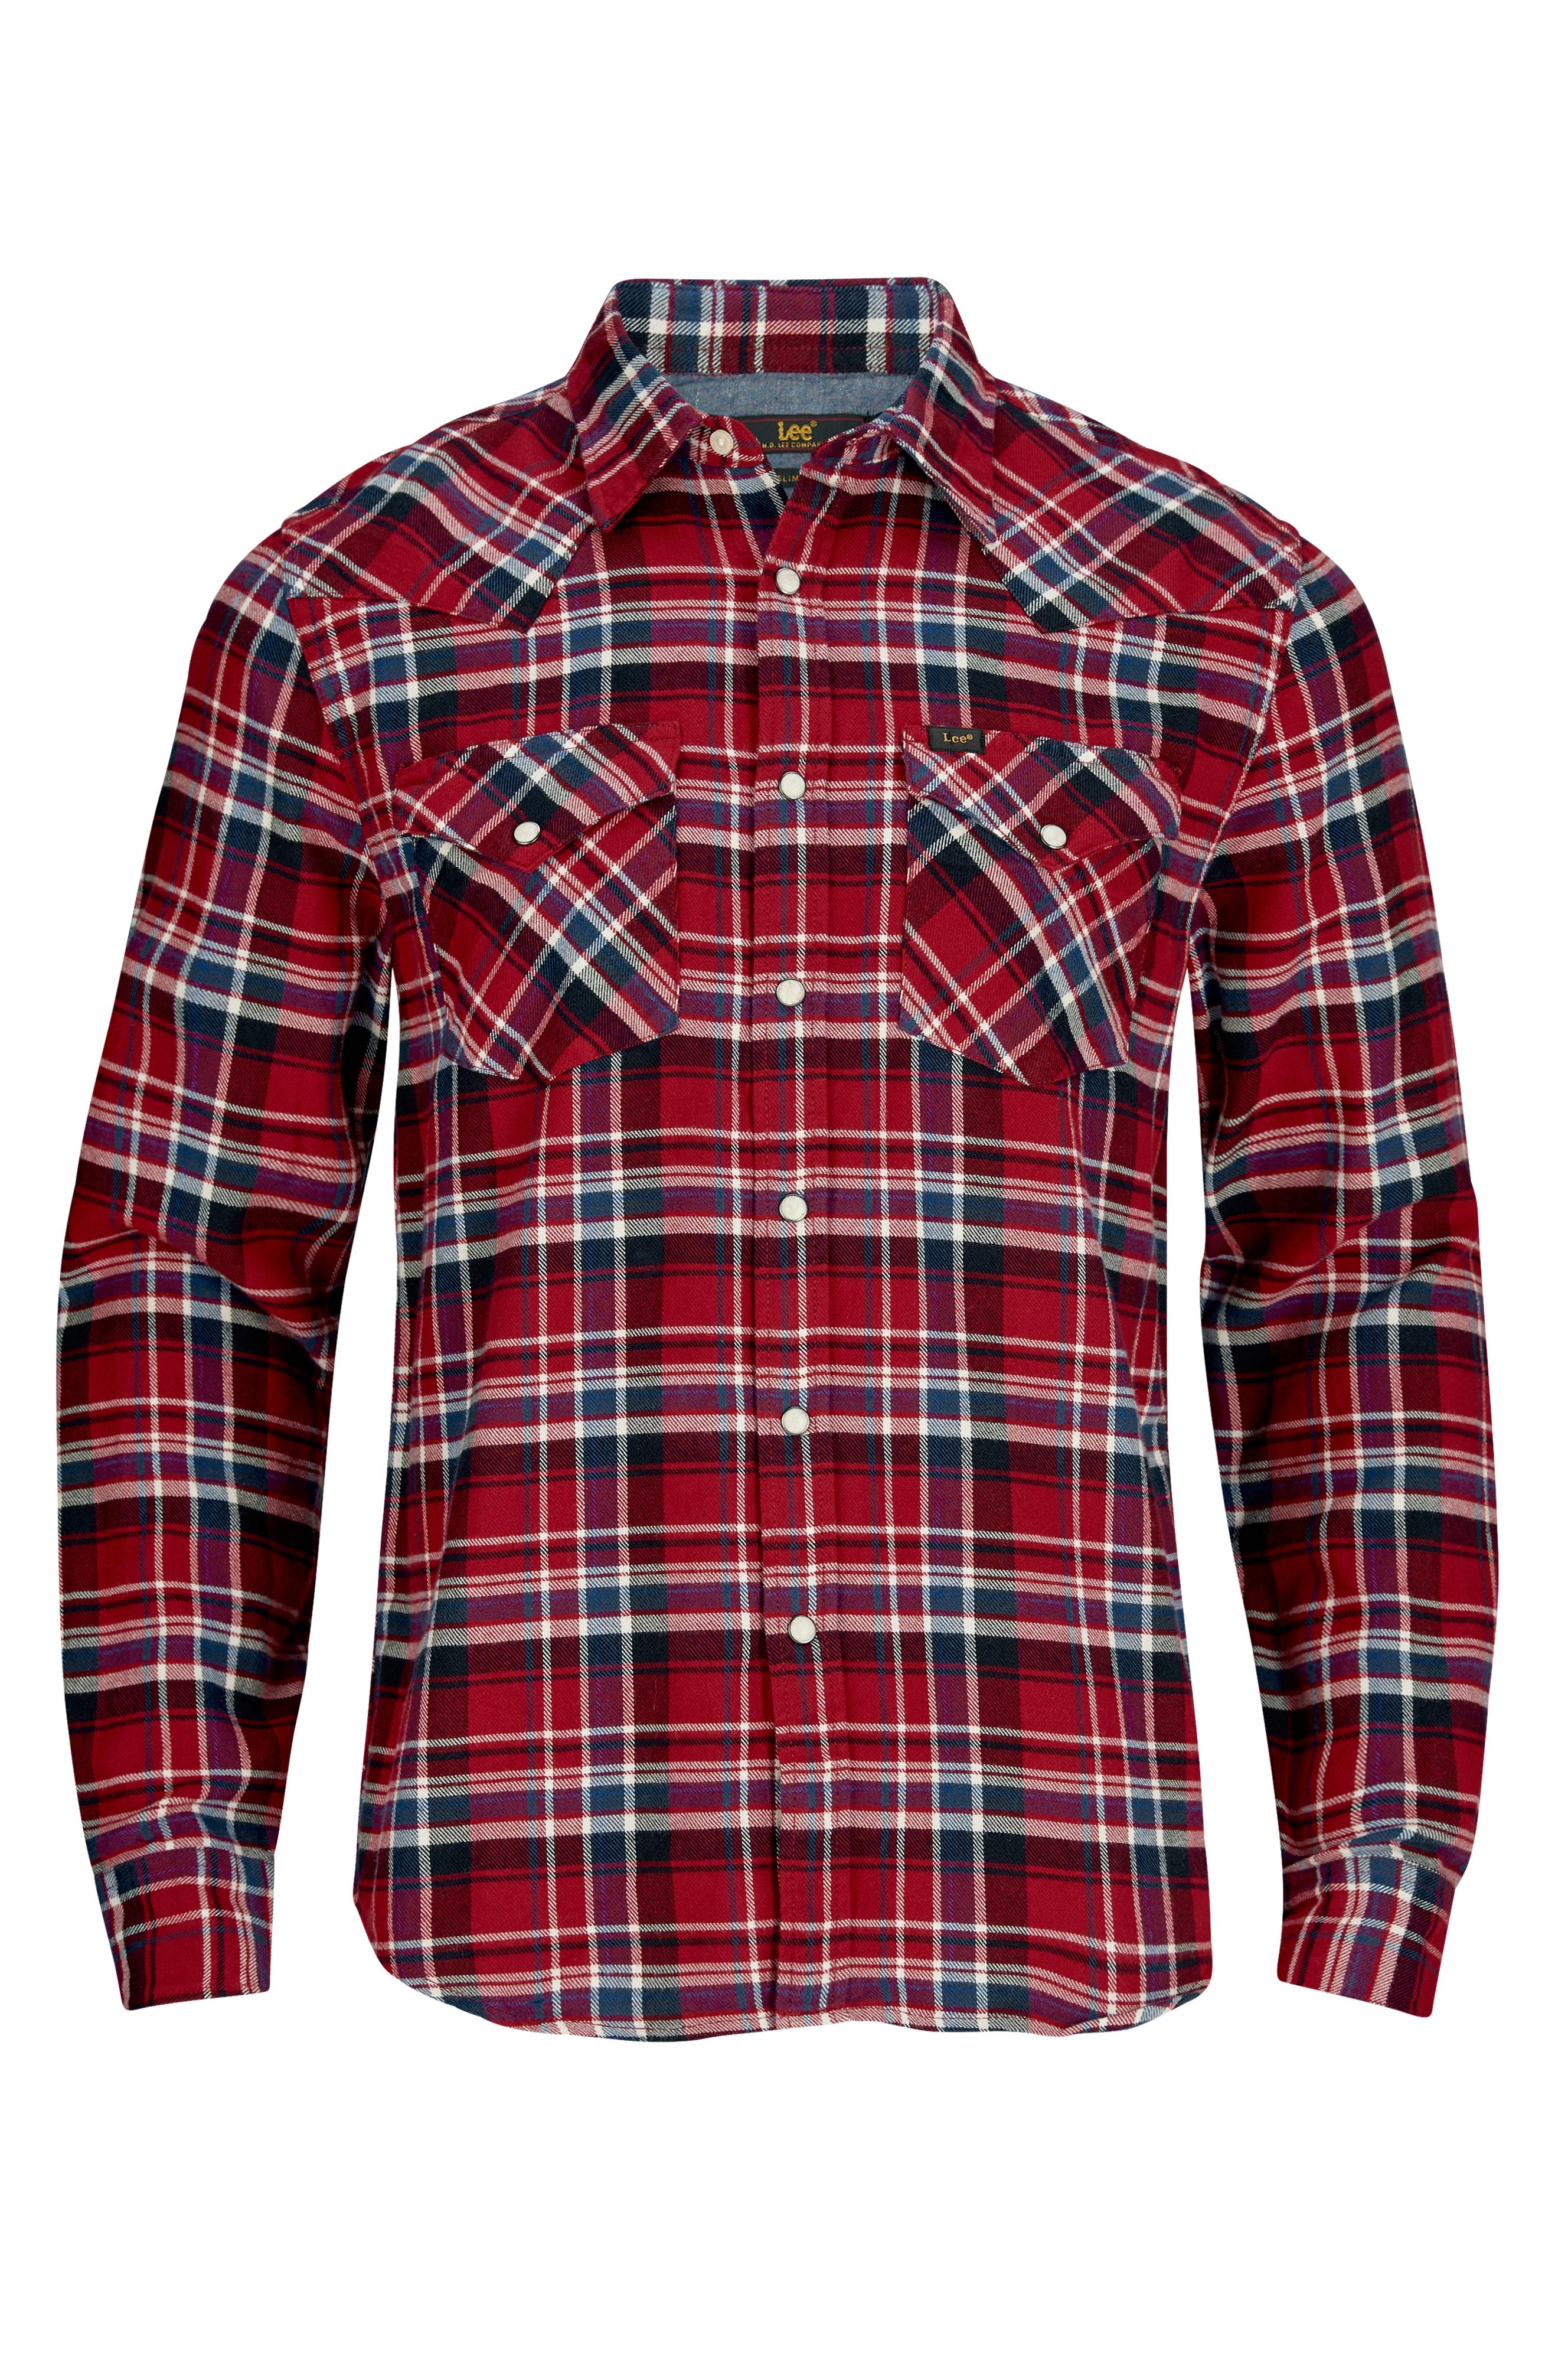 Lee Skjorte Western Rød Langermede skjorter til herre